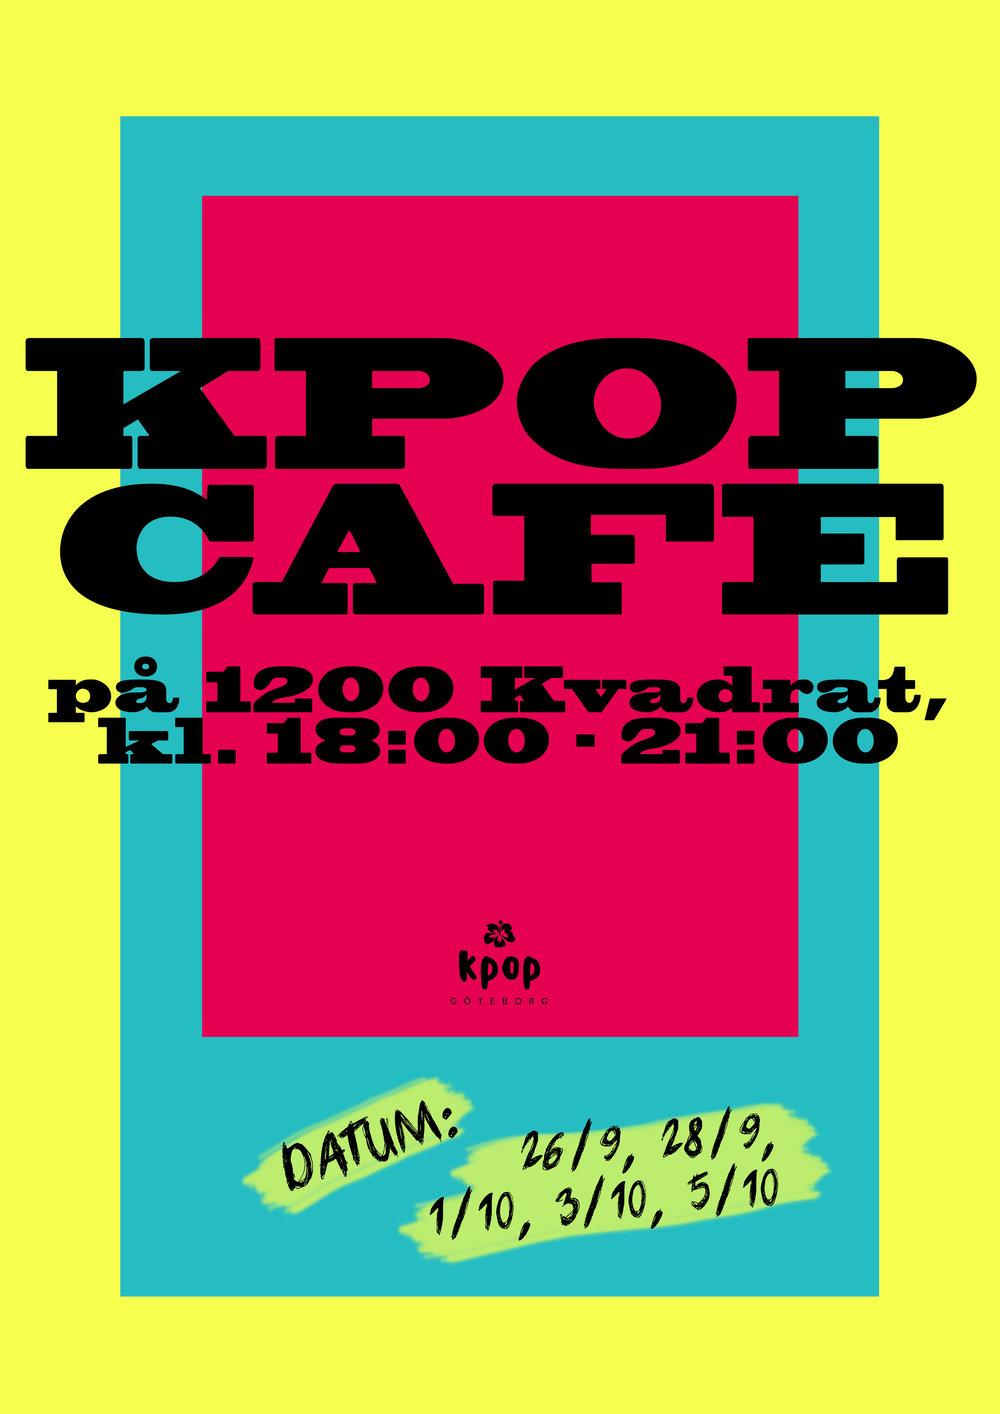 kpop cafe.jpg